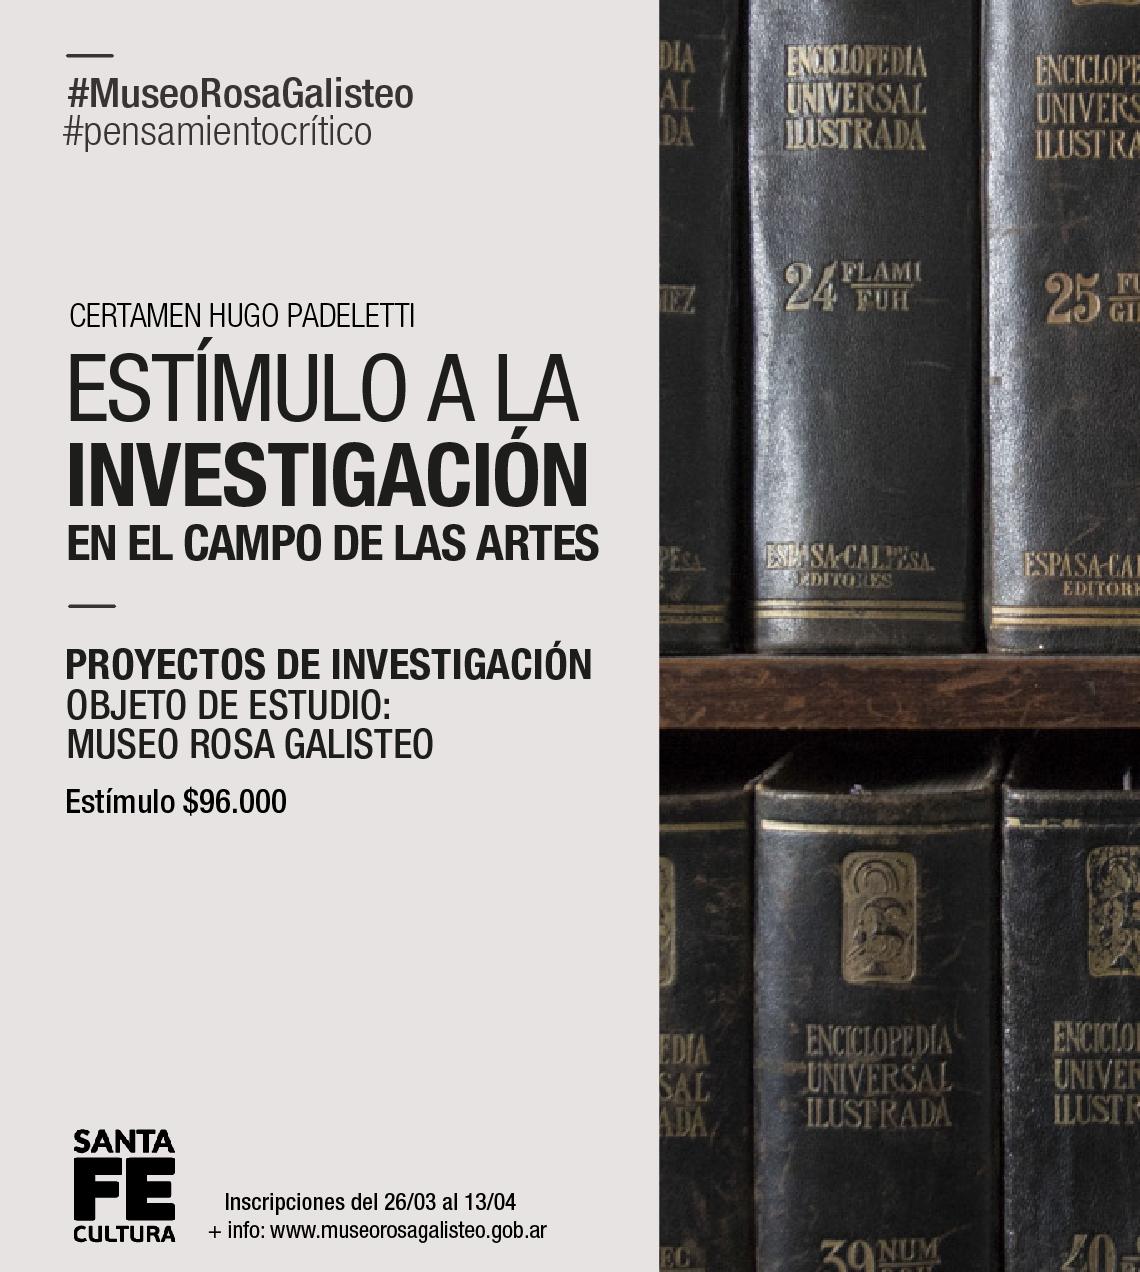 MUSEO ROSA GALISTEO DE RODRIGUEZ|CONCURSO DE INVESTIGACION HUGO PADELETTI.